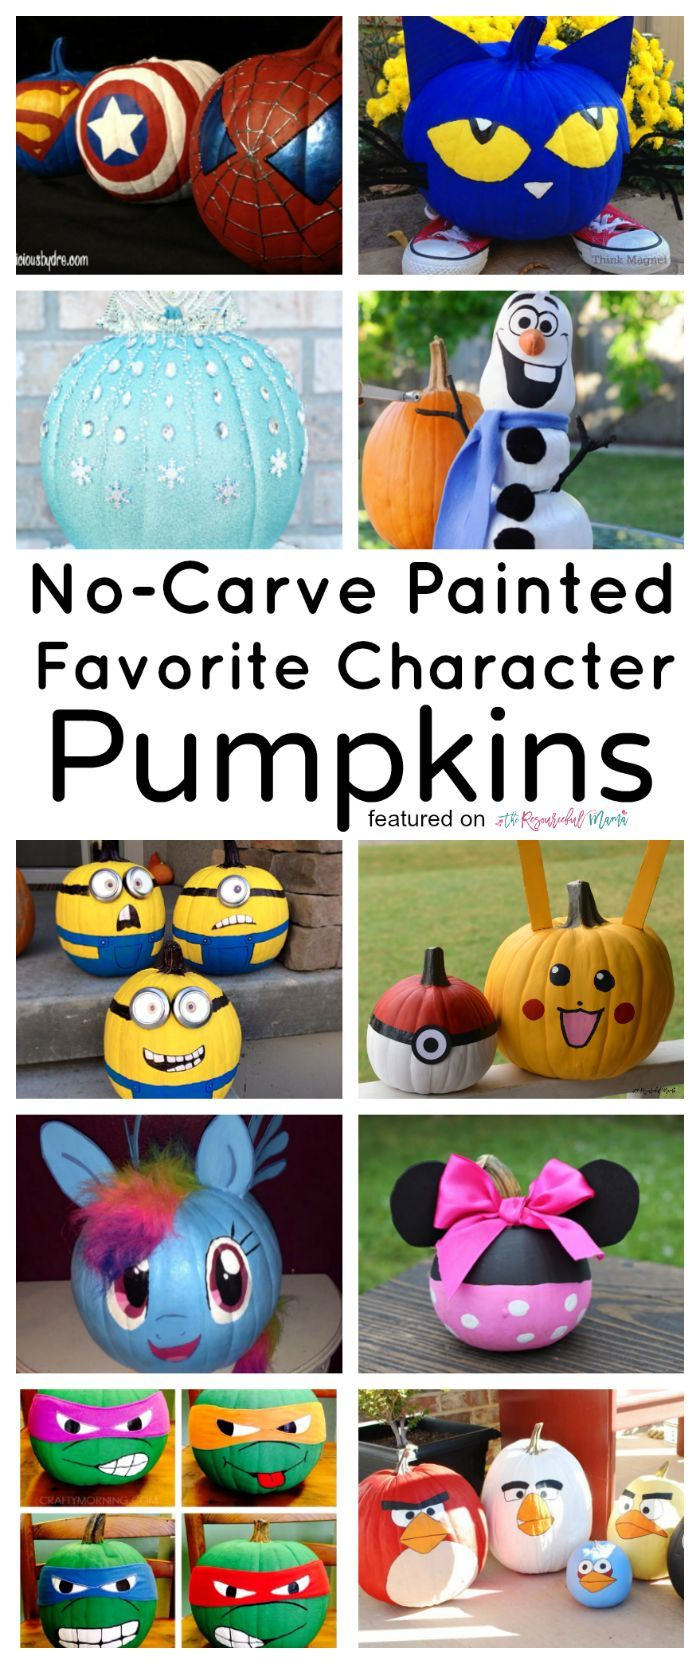 10 no carve painted favorite character pumpkins pumpkin decorating